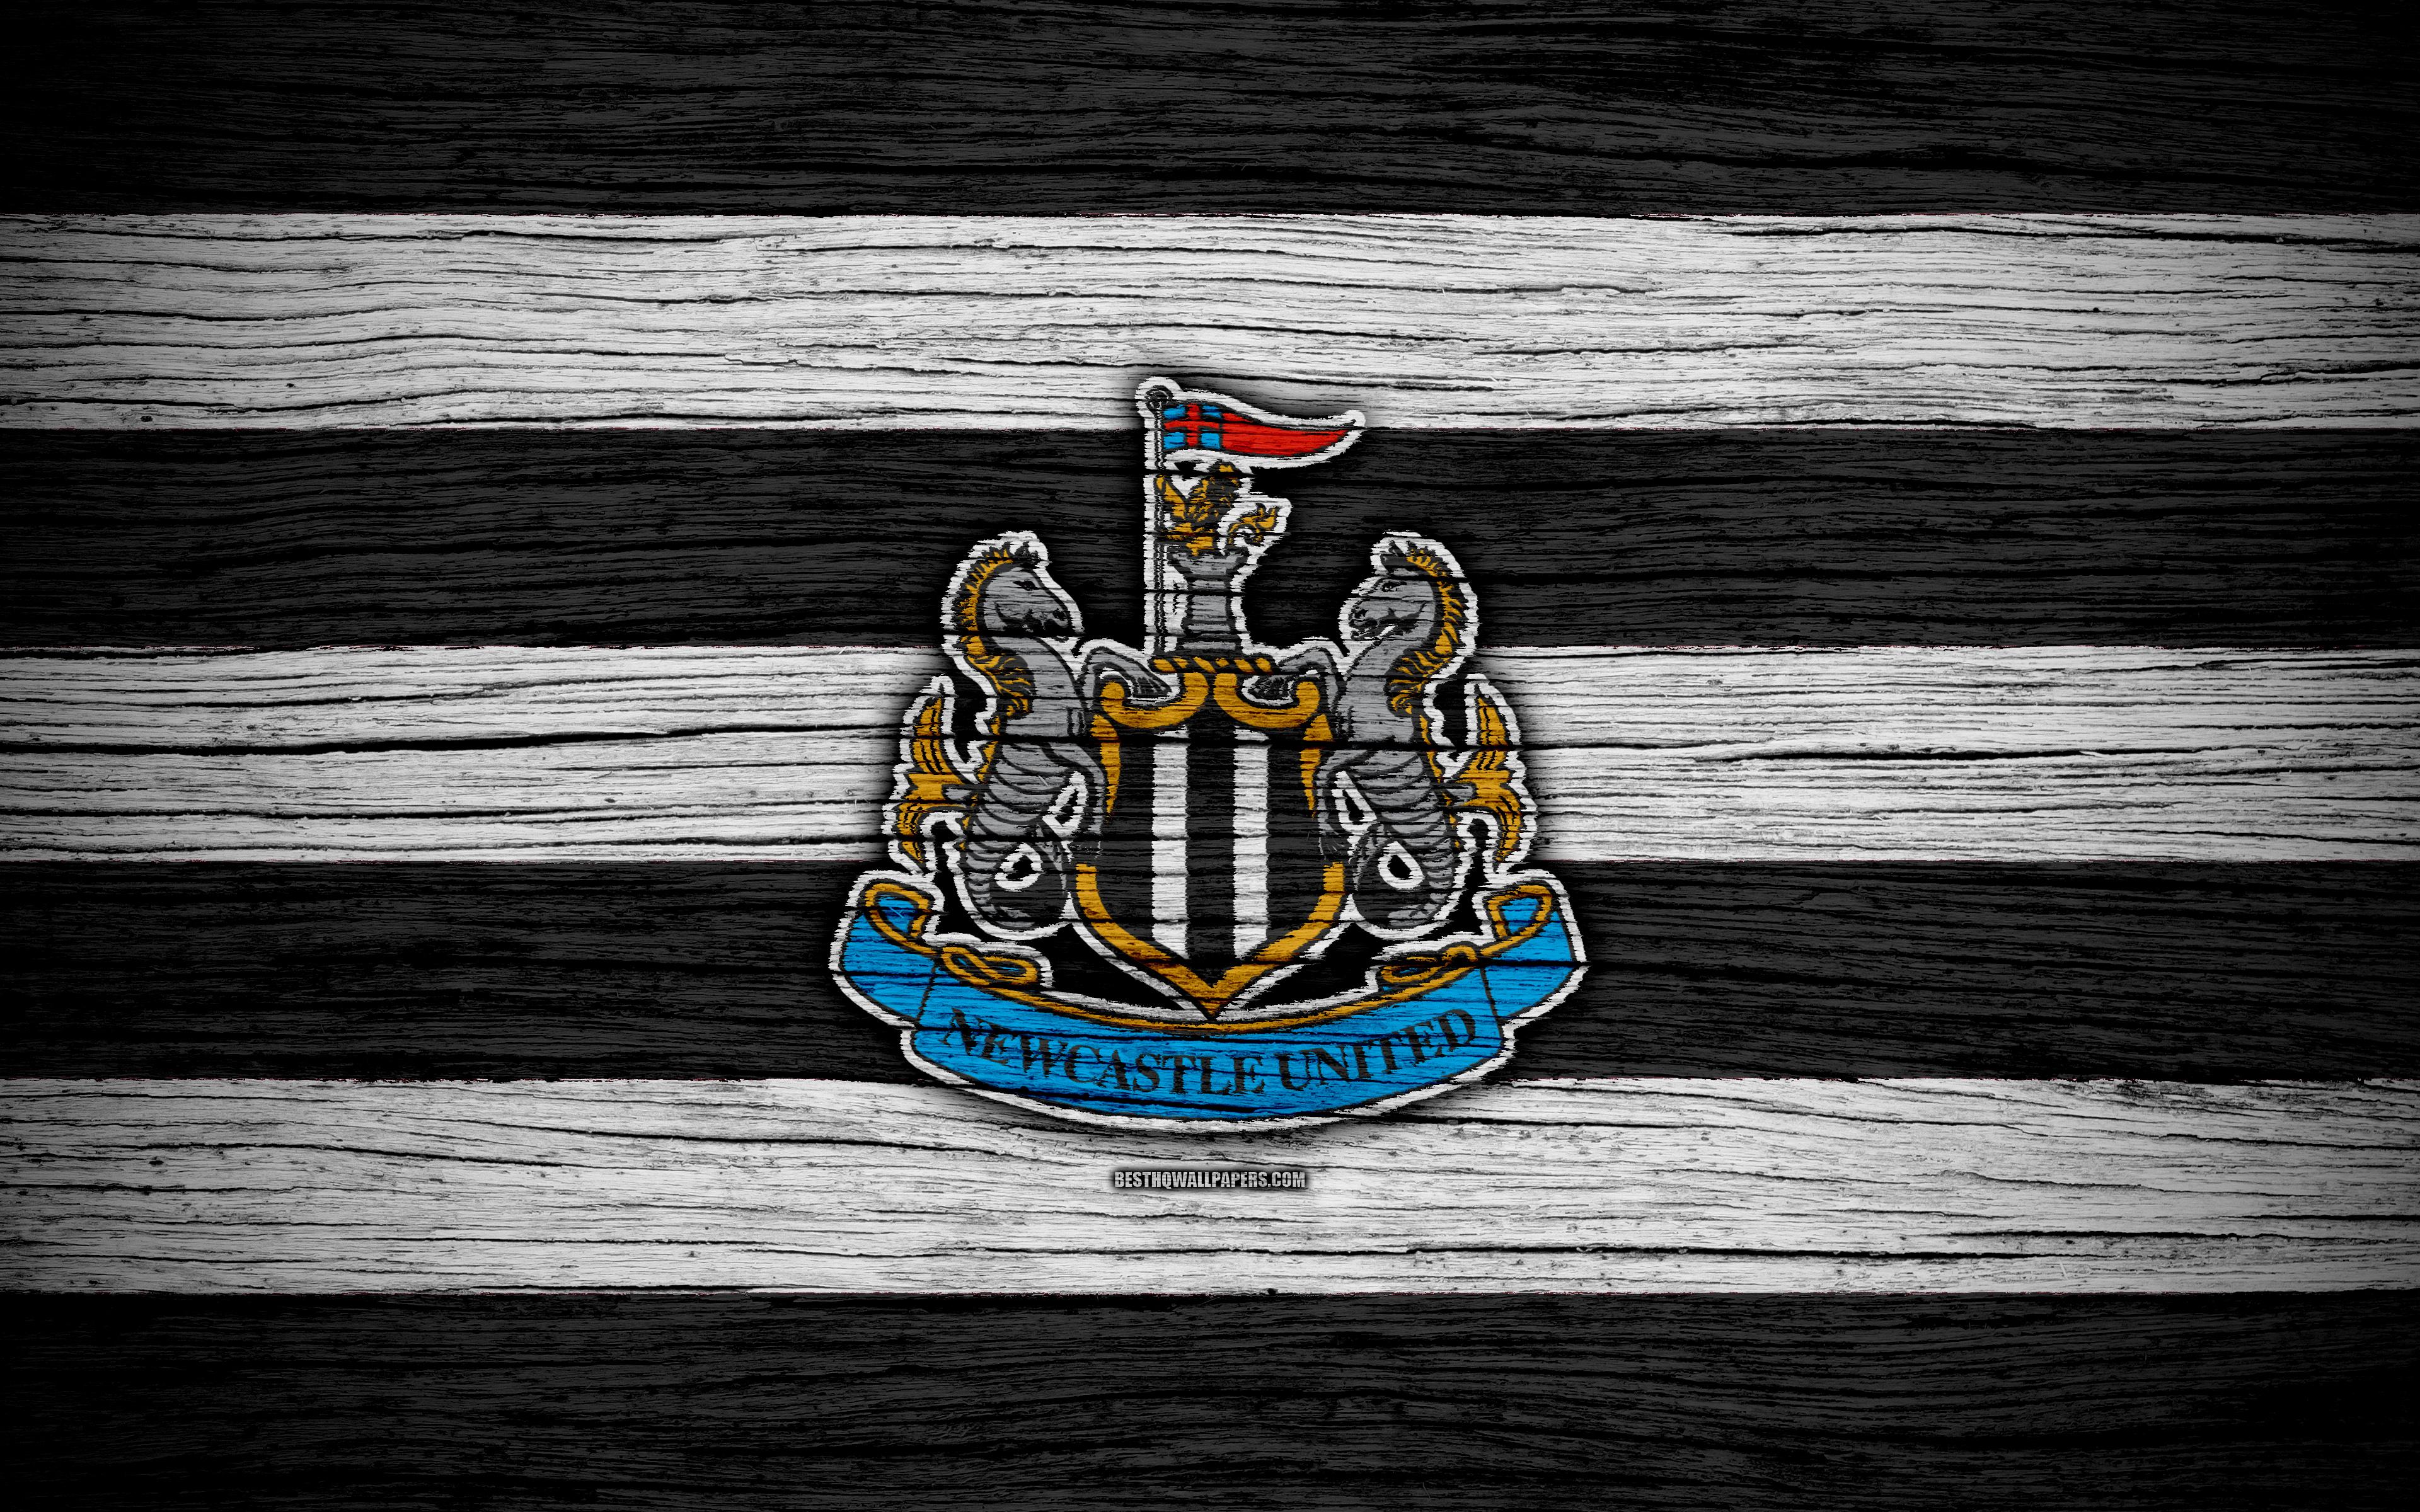 Download wallpapers Newcastle United 4k Premier League logo 3840x2400